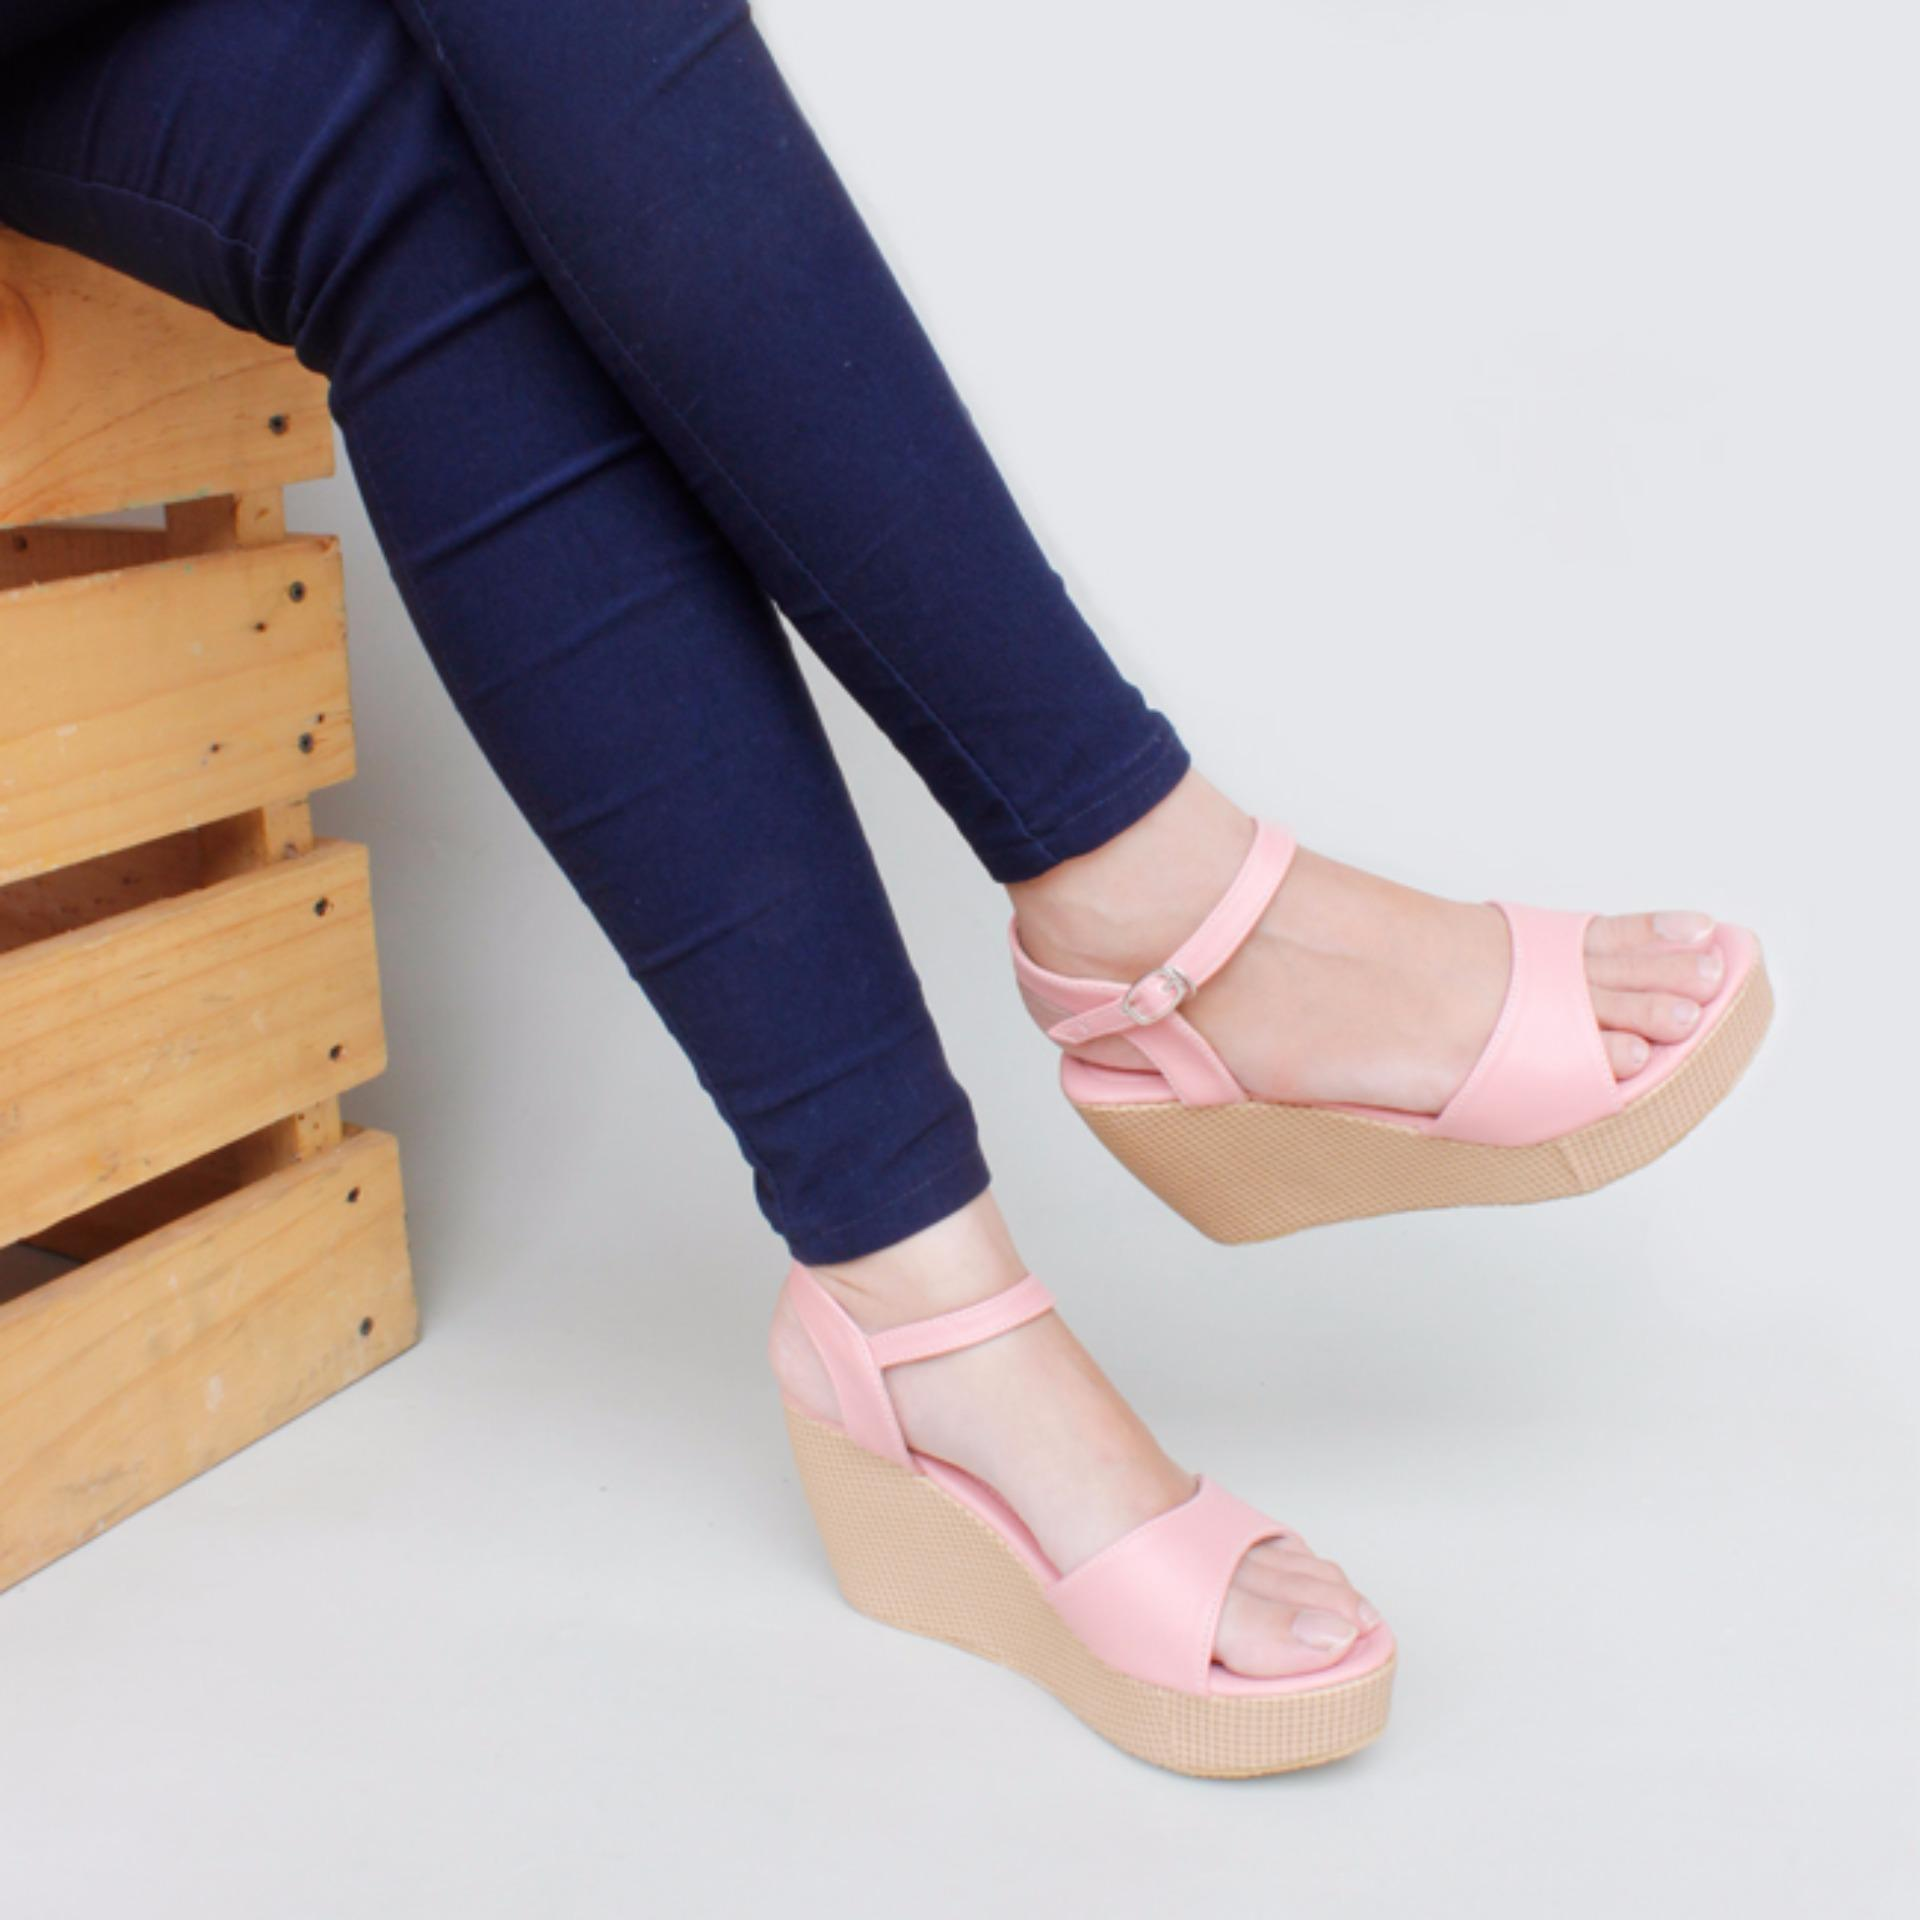 ... Moya Sepatu Wanita Wedges Ankle Strap CY07 - Salem ...